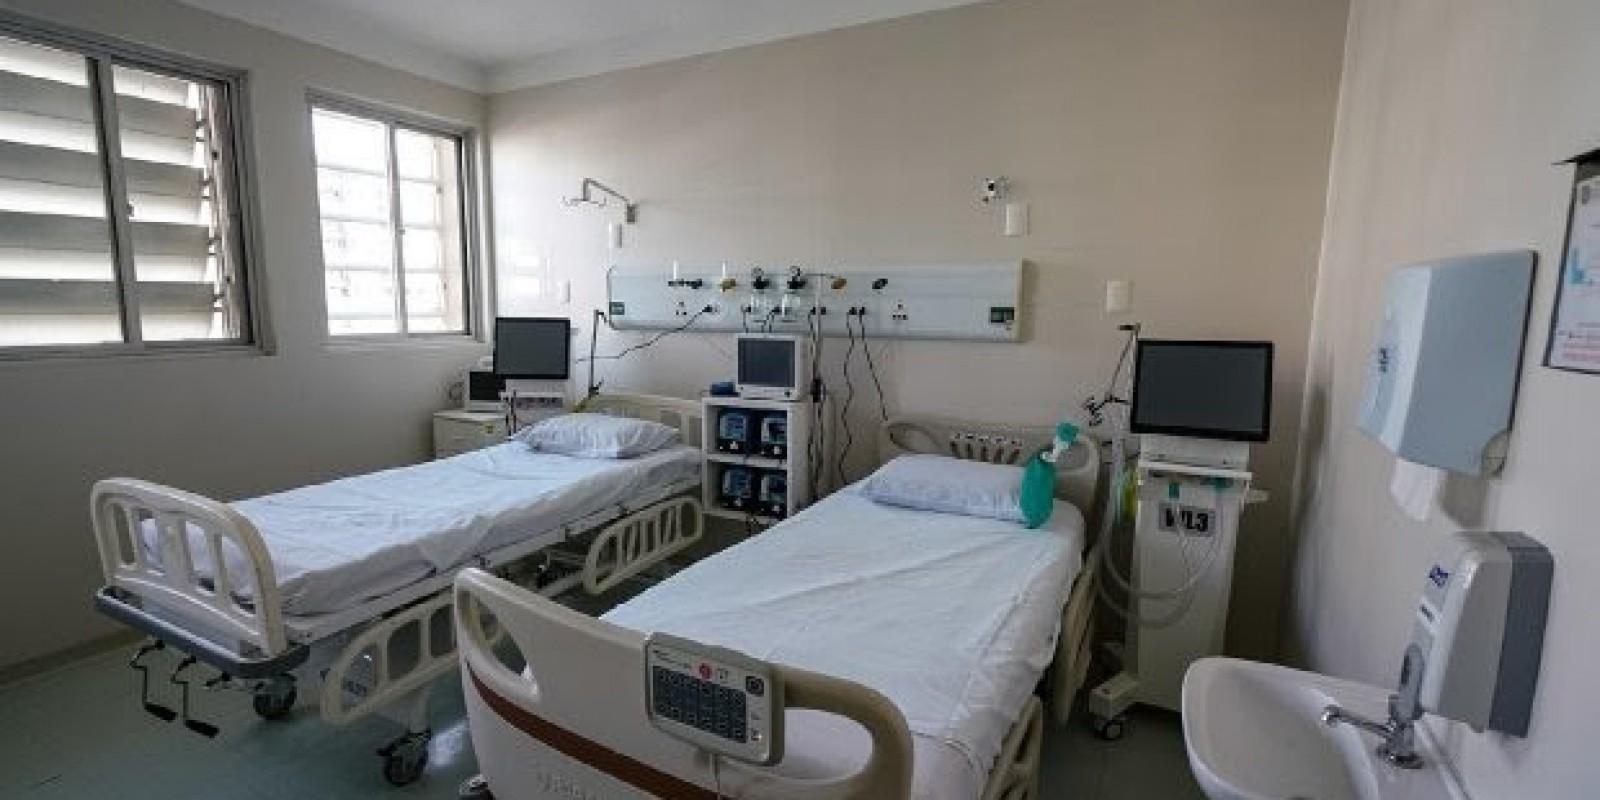 Governo de Santa Catarina habilita 63 novos leitos de UTI para enfrentamento à pandemia